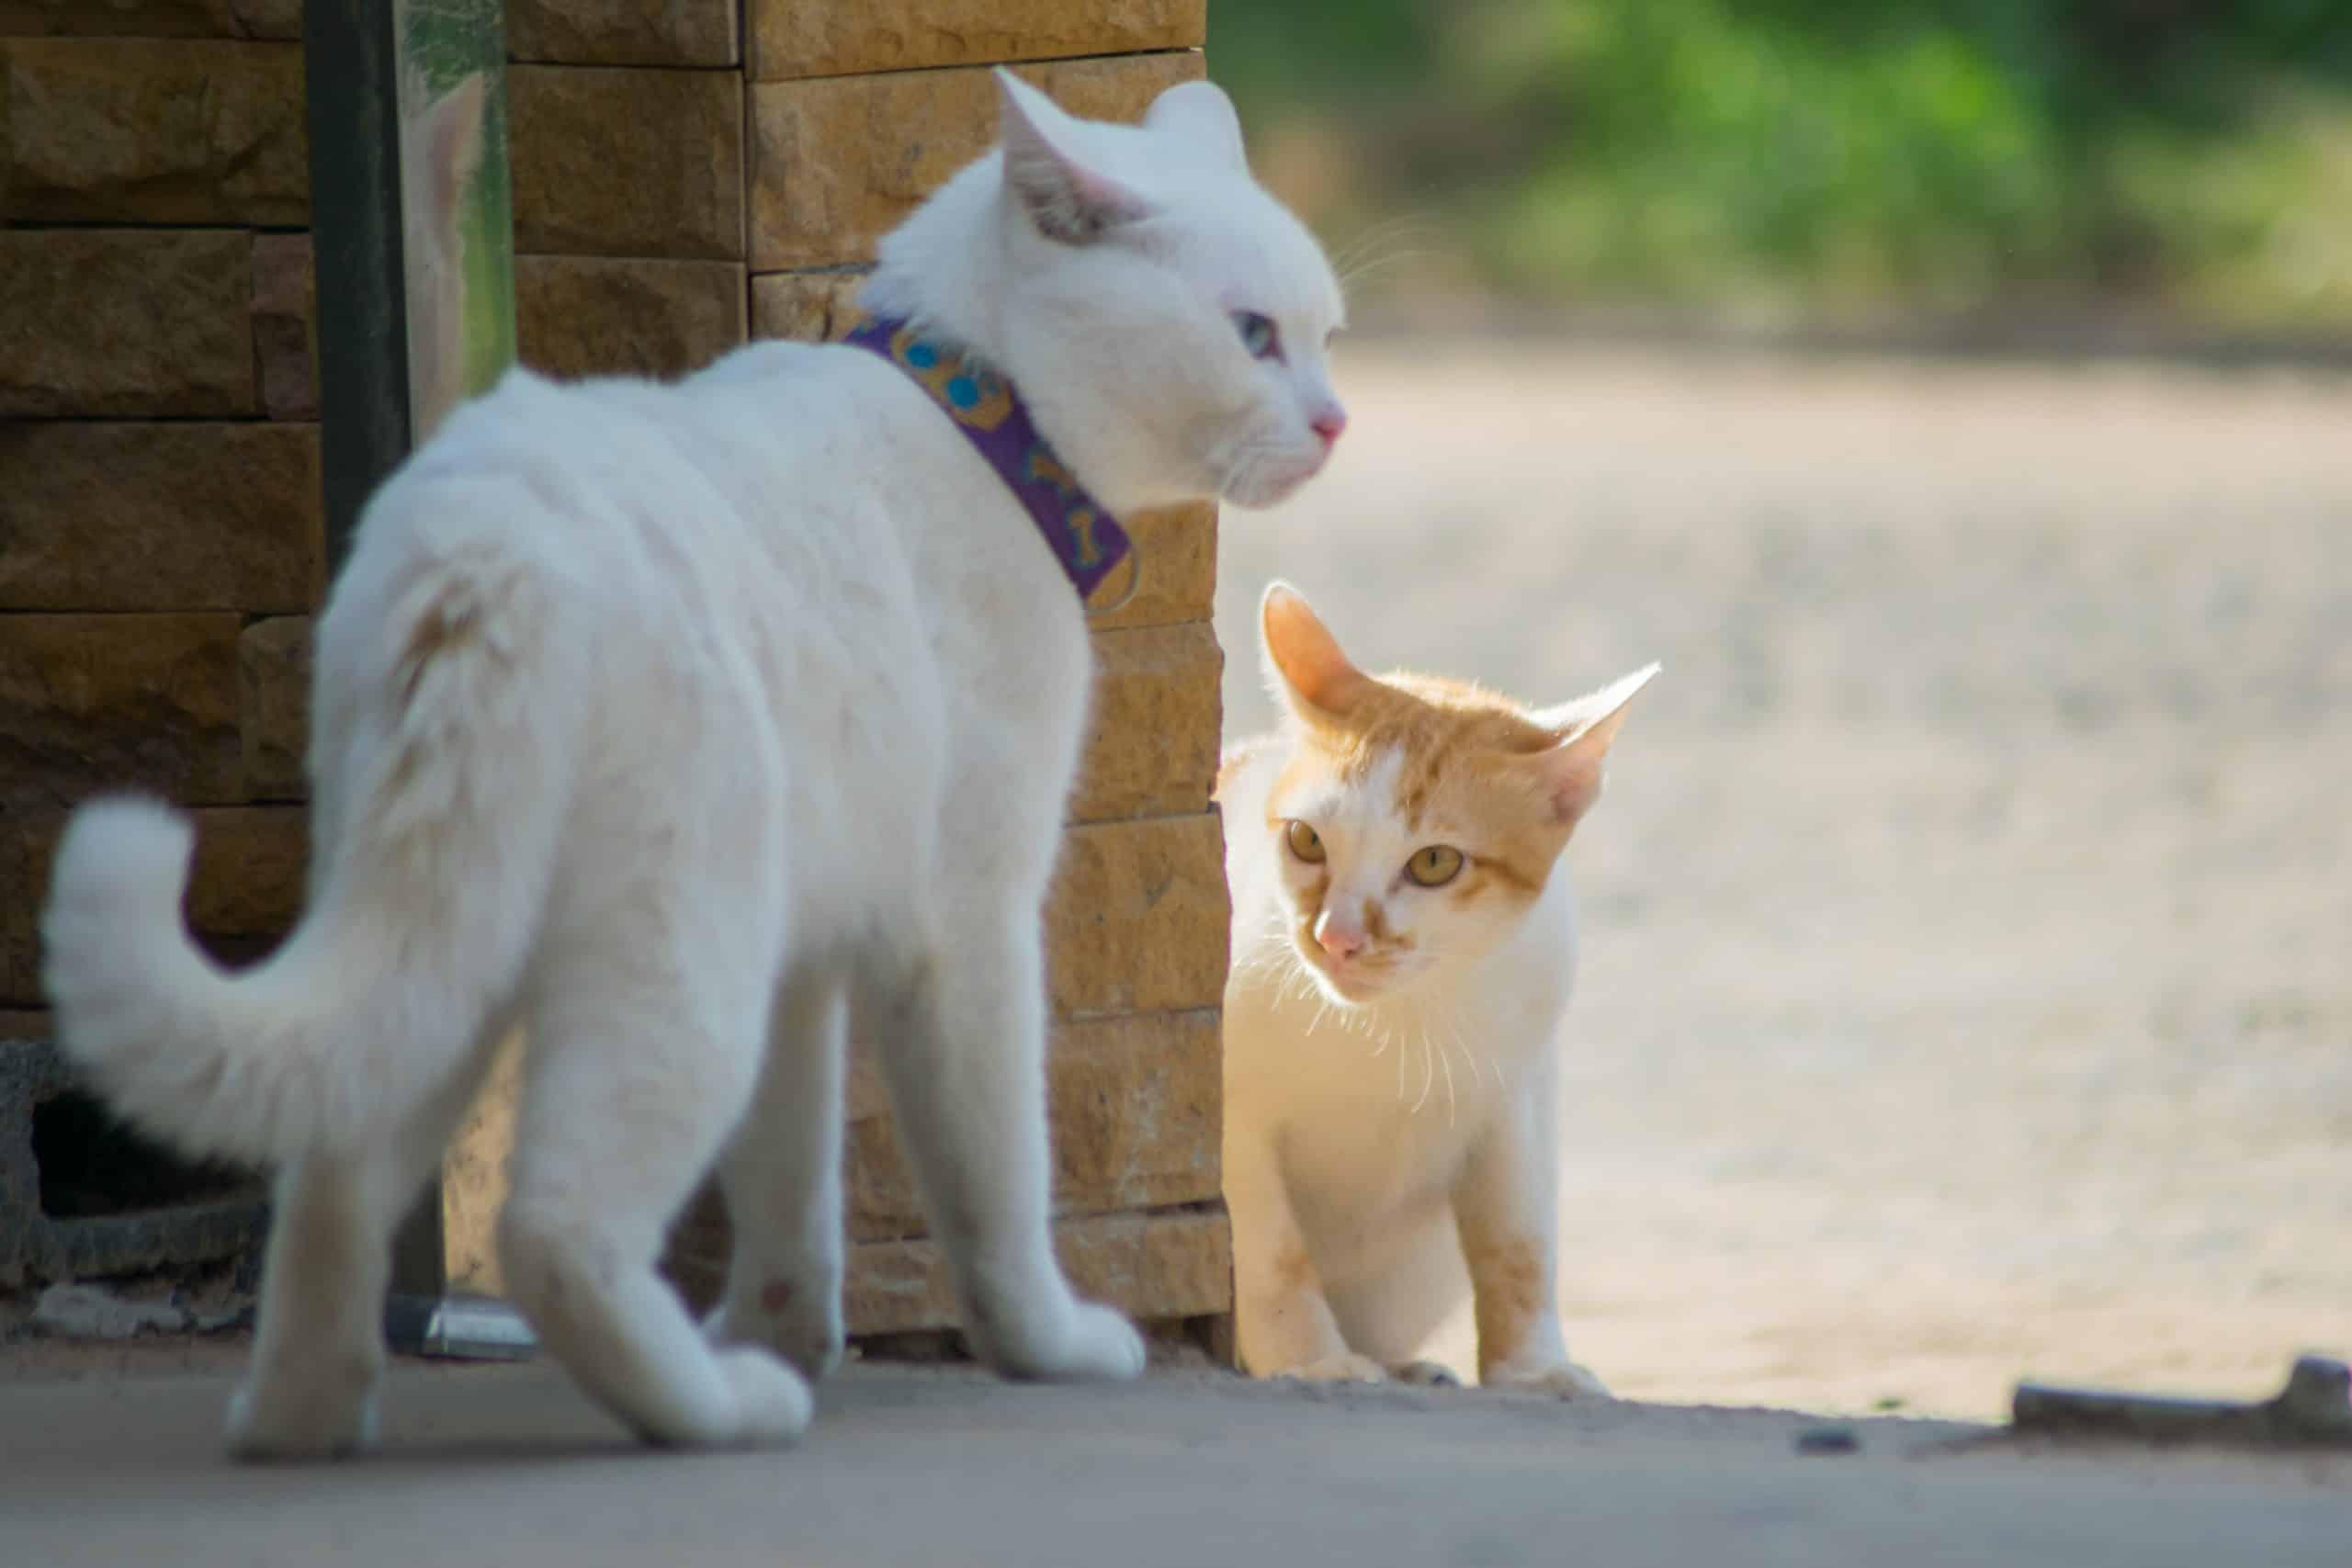 cats make eye contact